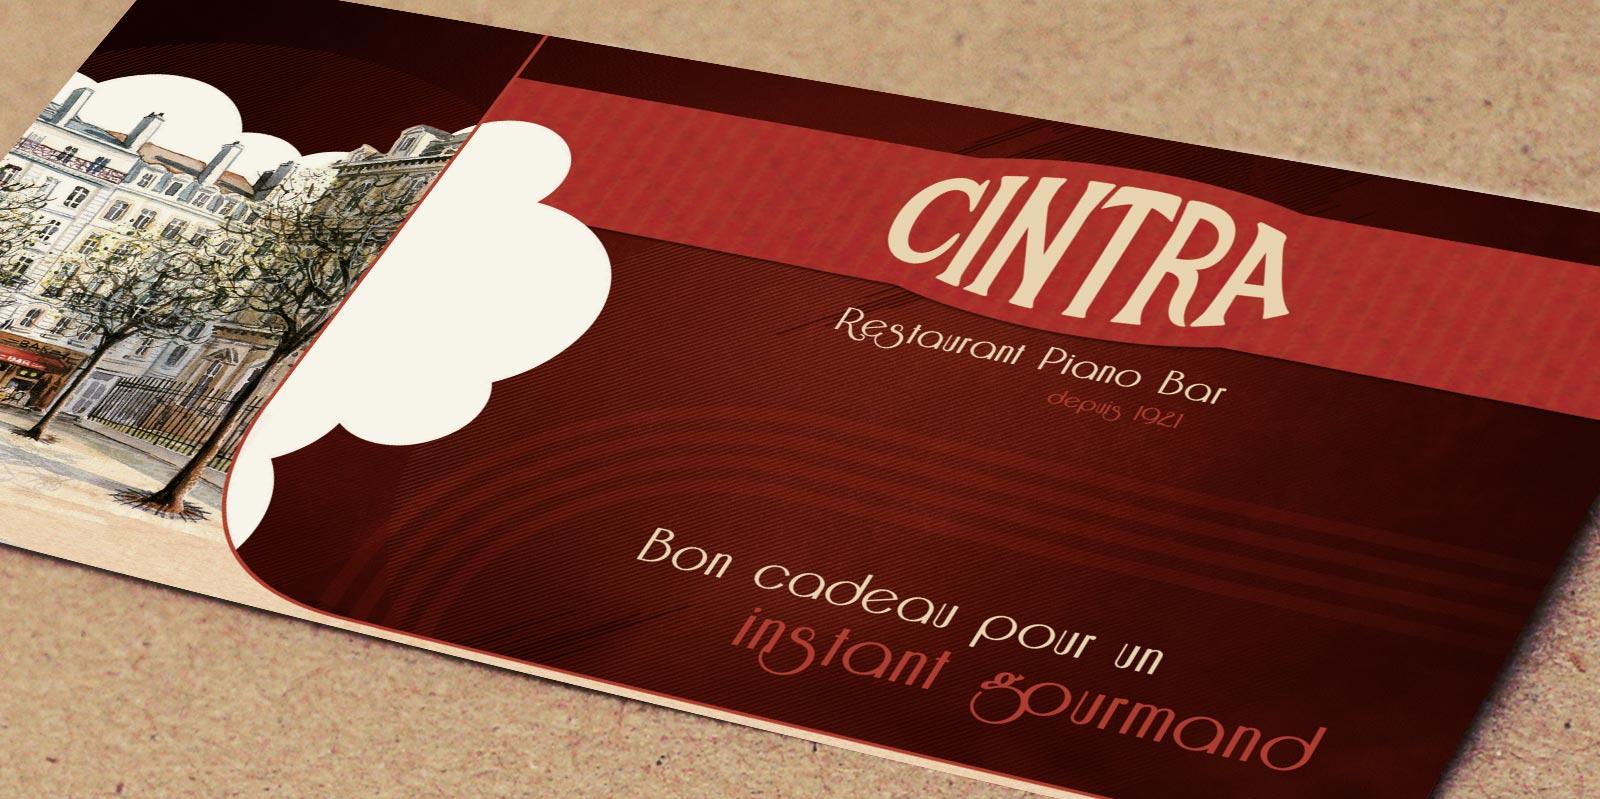 Le Cintra - Restaurant Piano Bar à Lyon